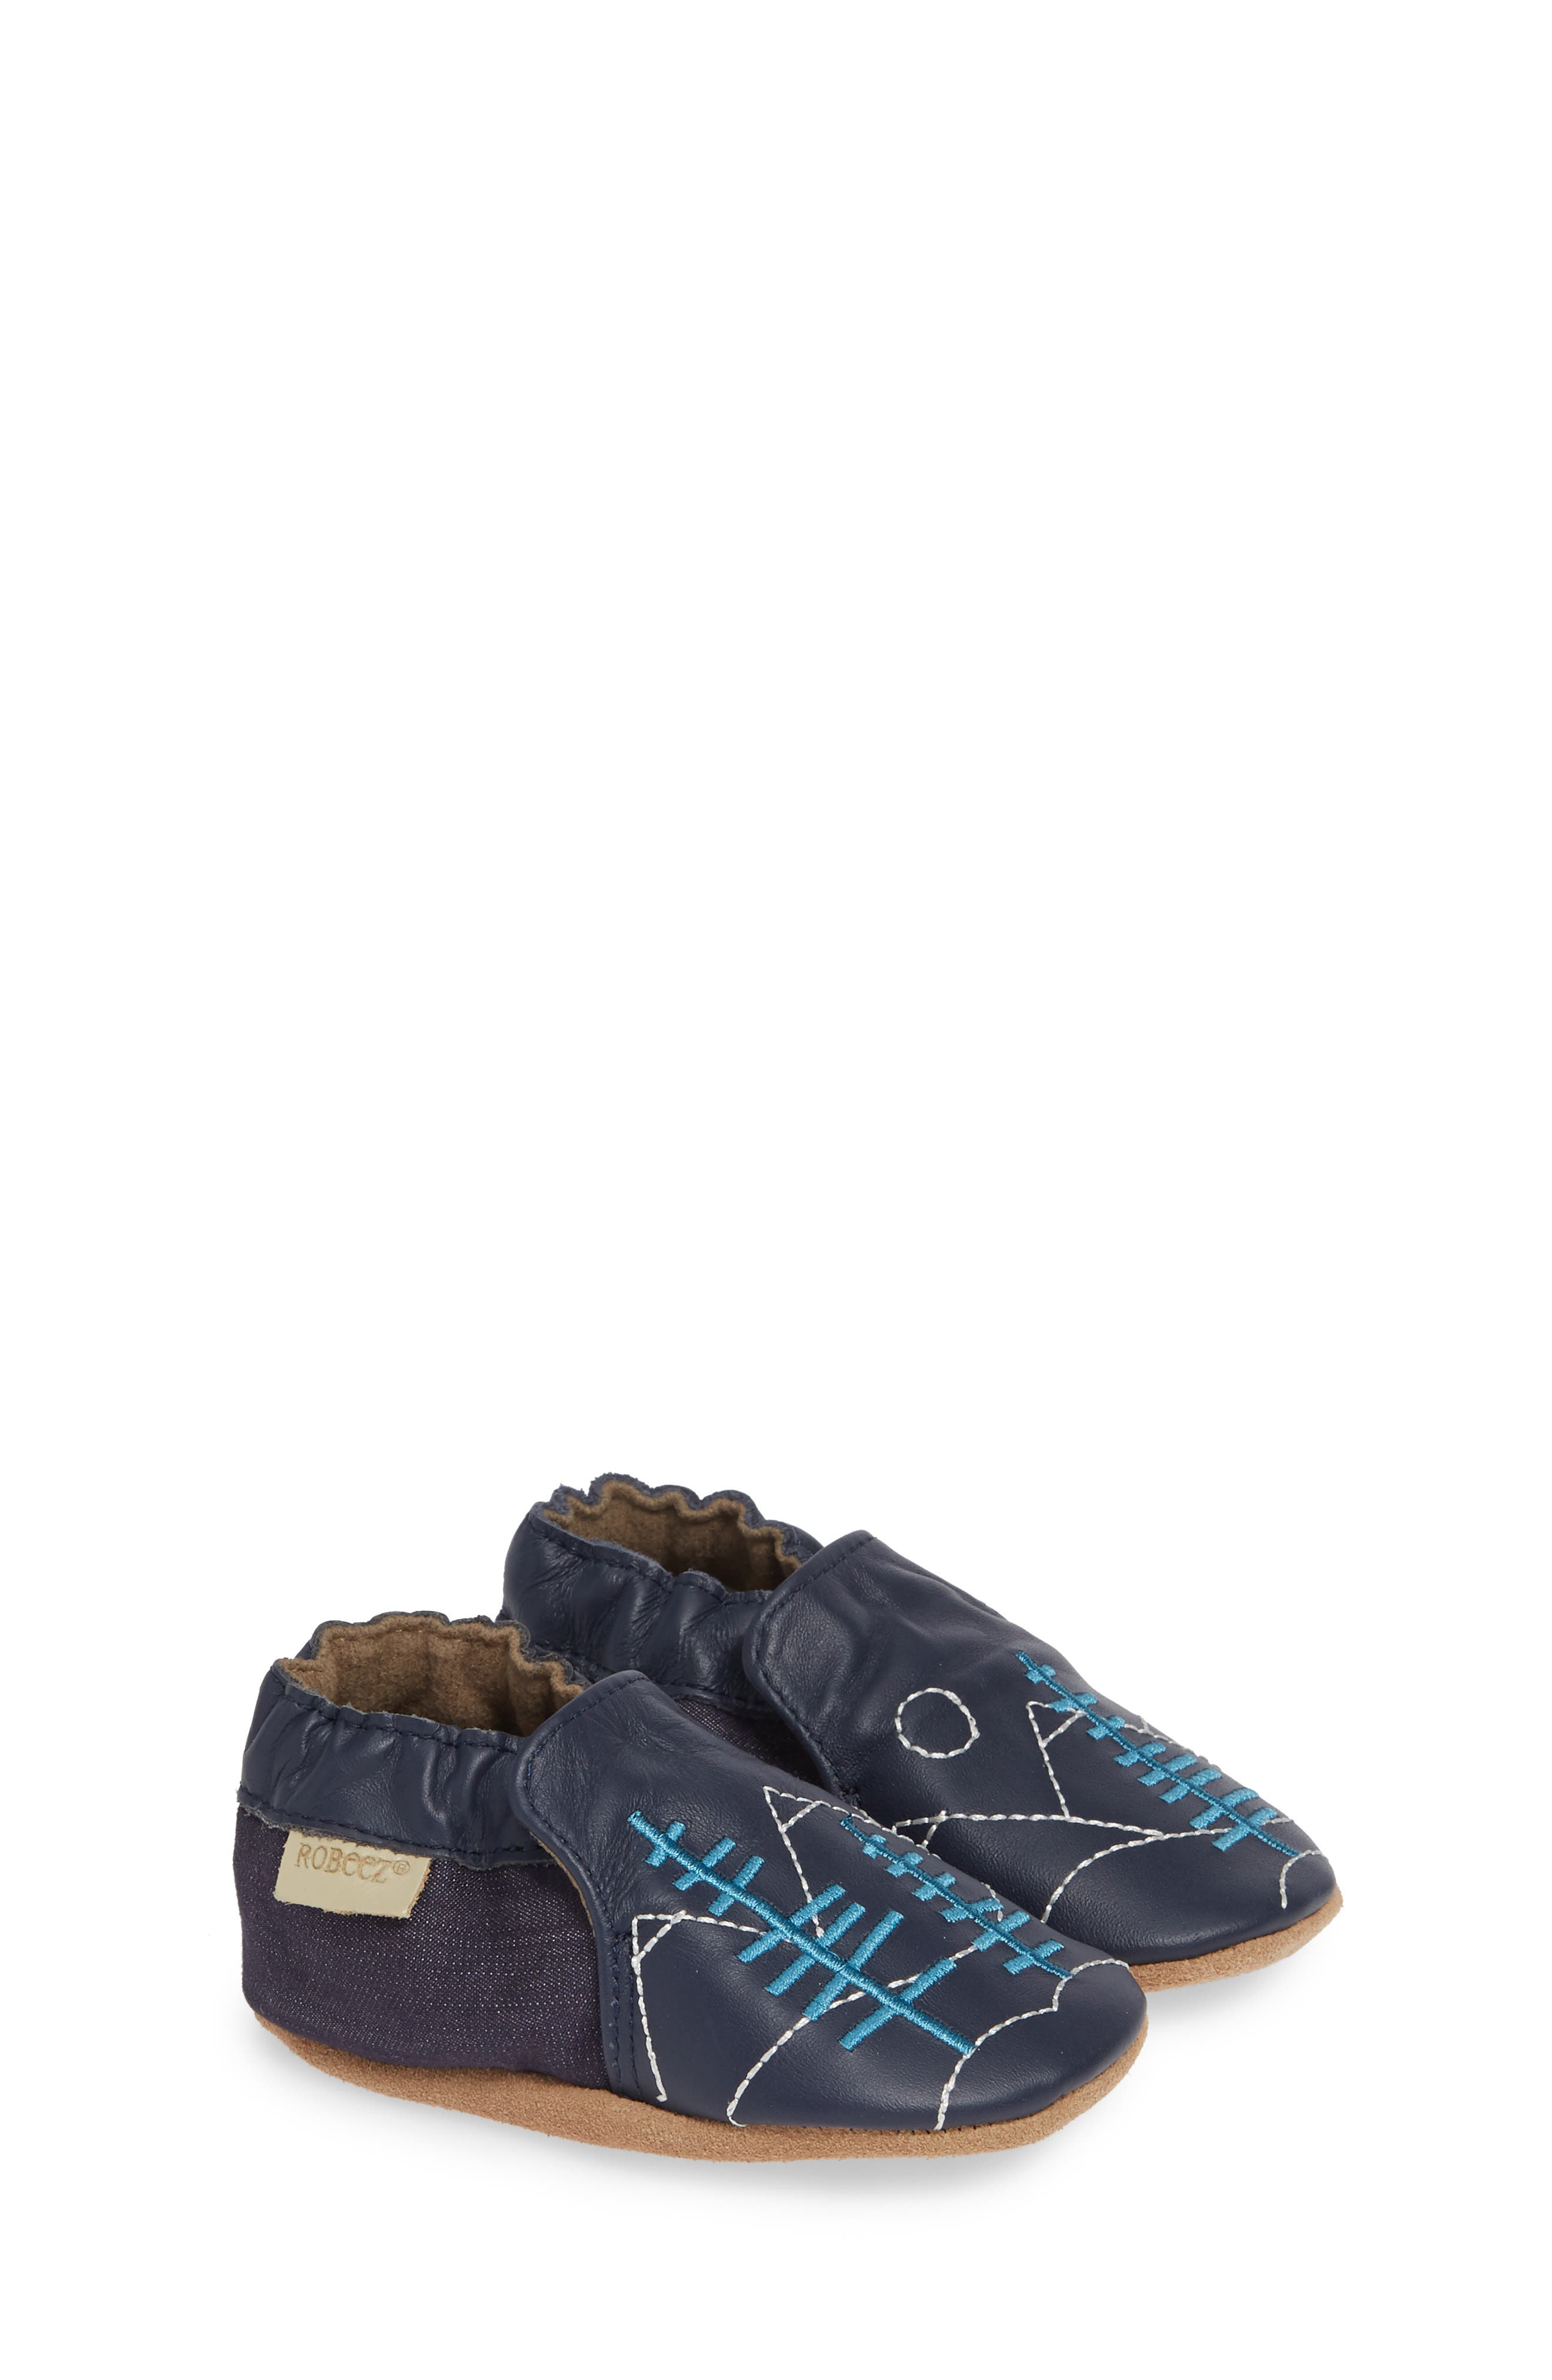 ROBEEZ<SUP>®</SUP>, Mountain Explorer Moccasin Crib Shoe, Alternate thumbnail 2, color, NAVY